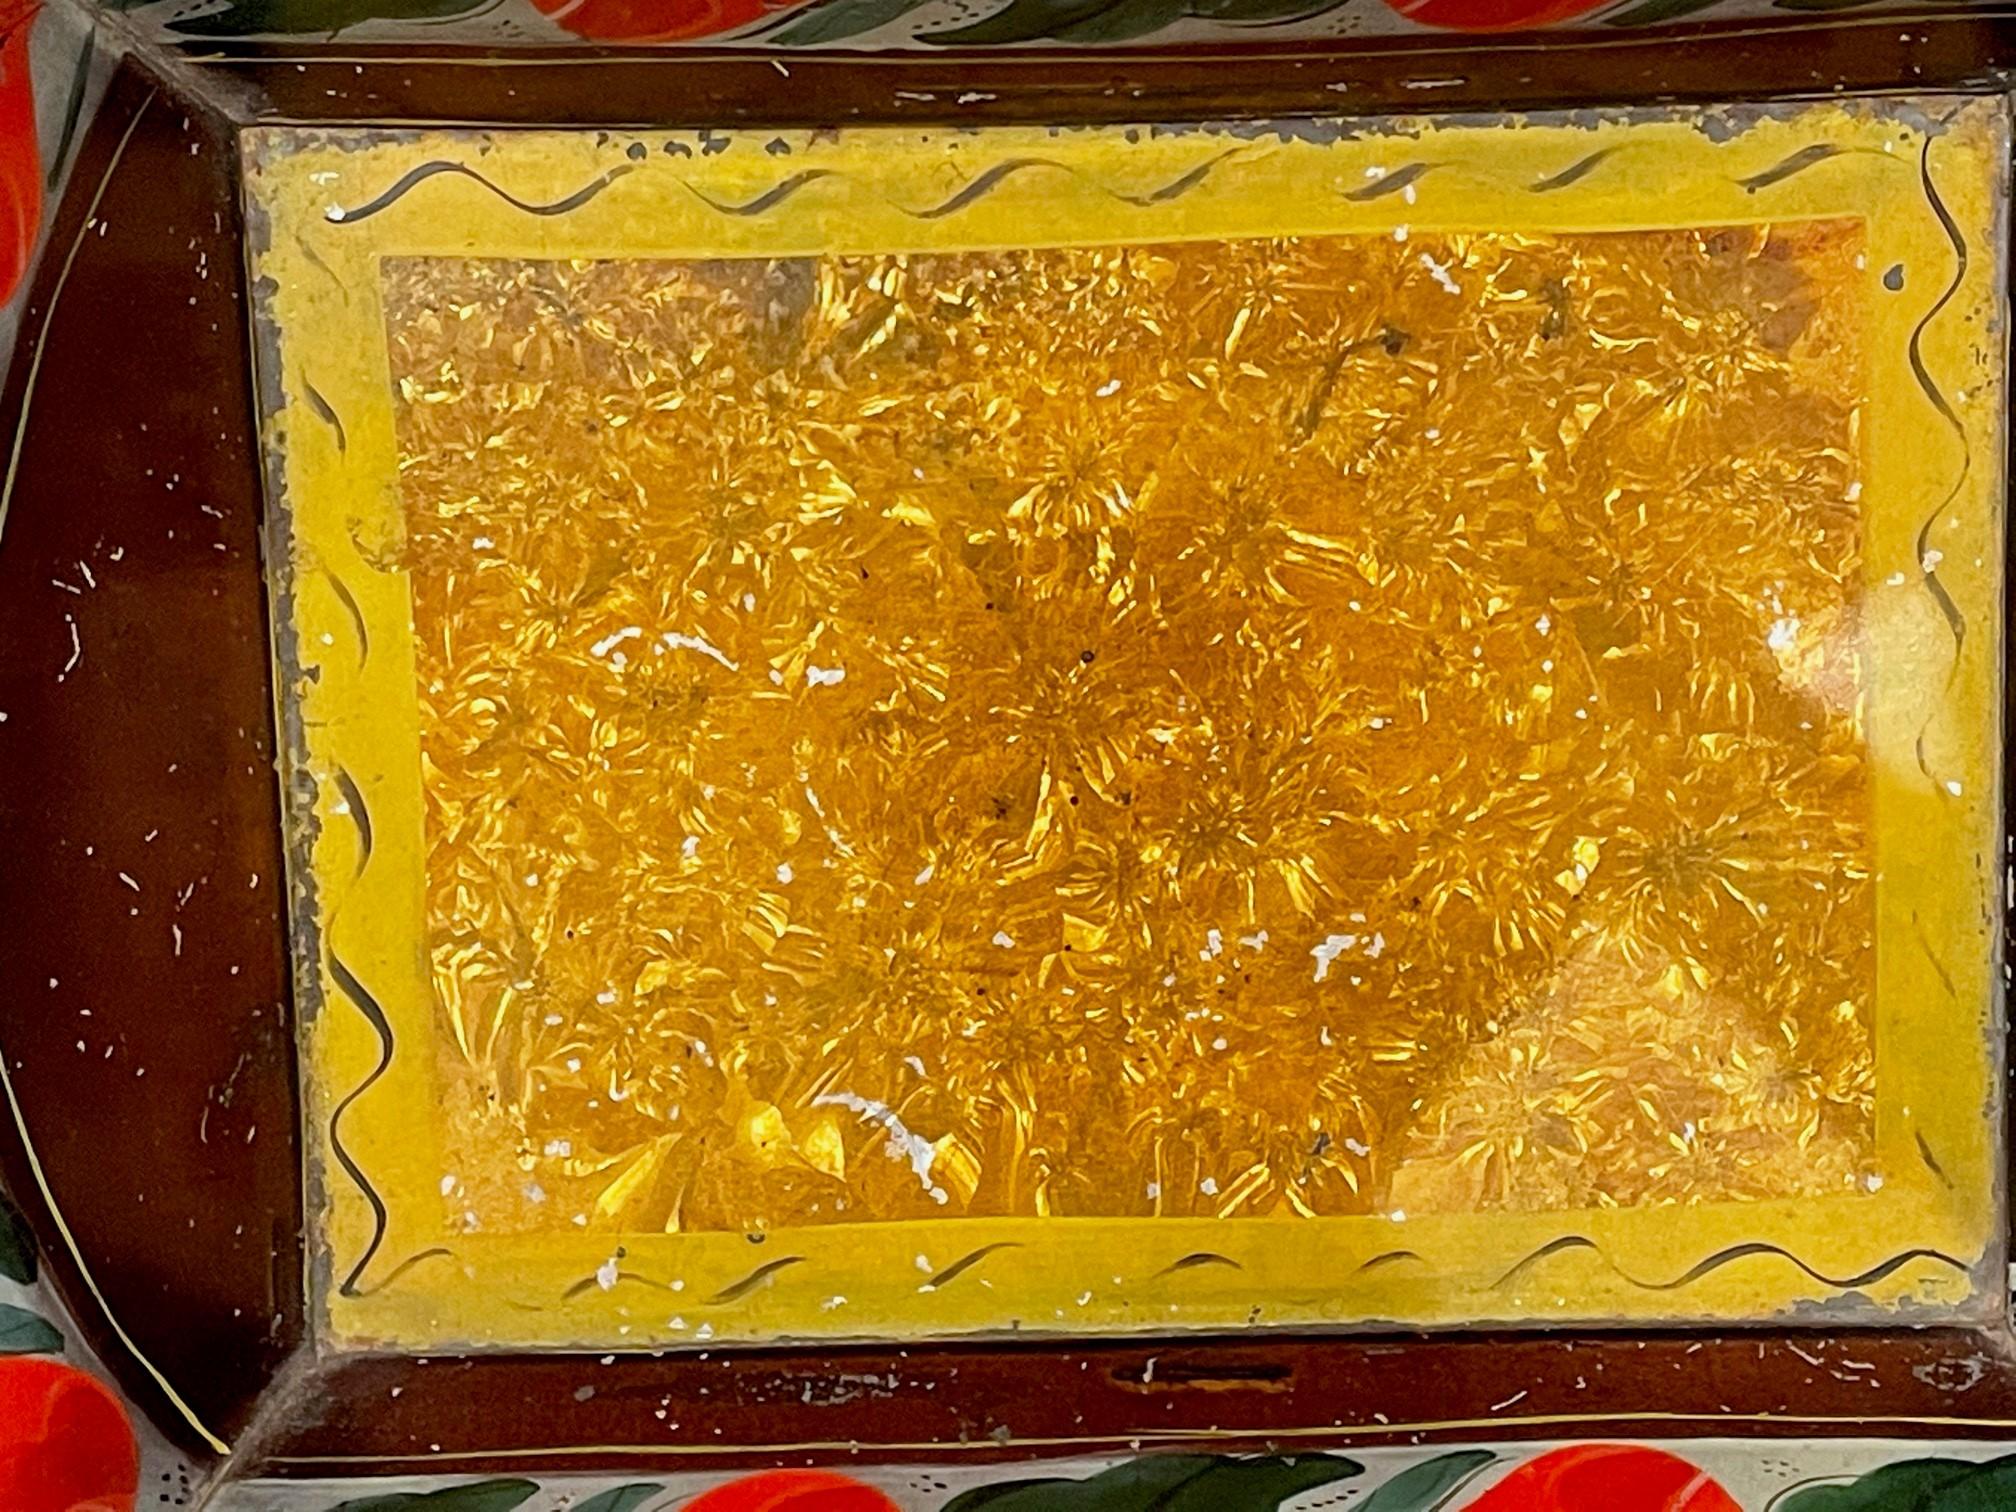 painted toleware bread pan rel=